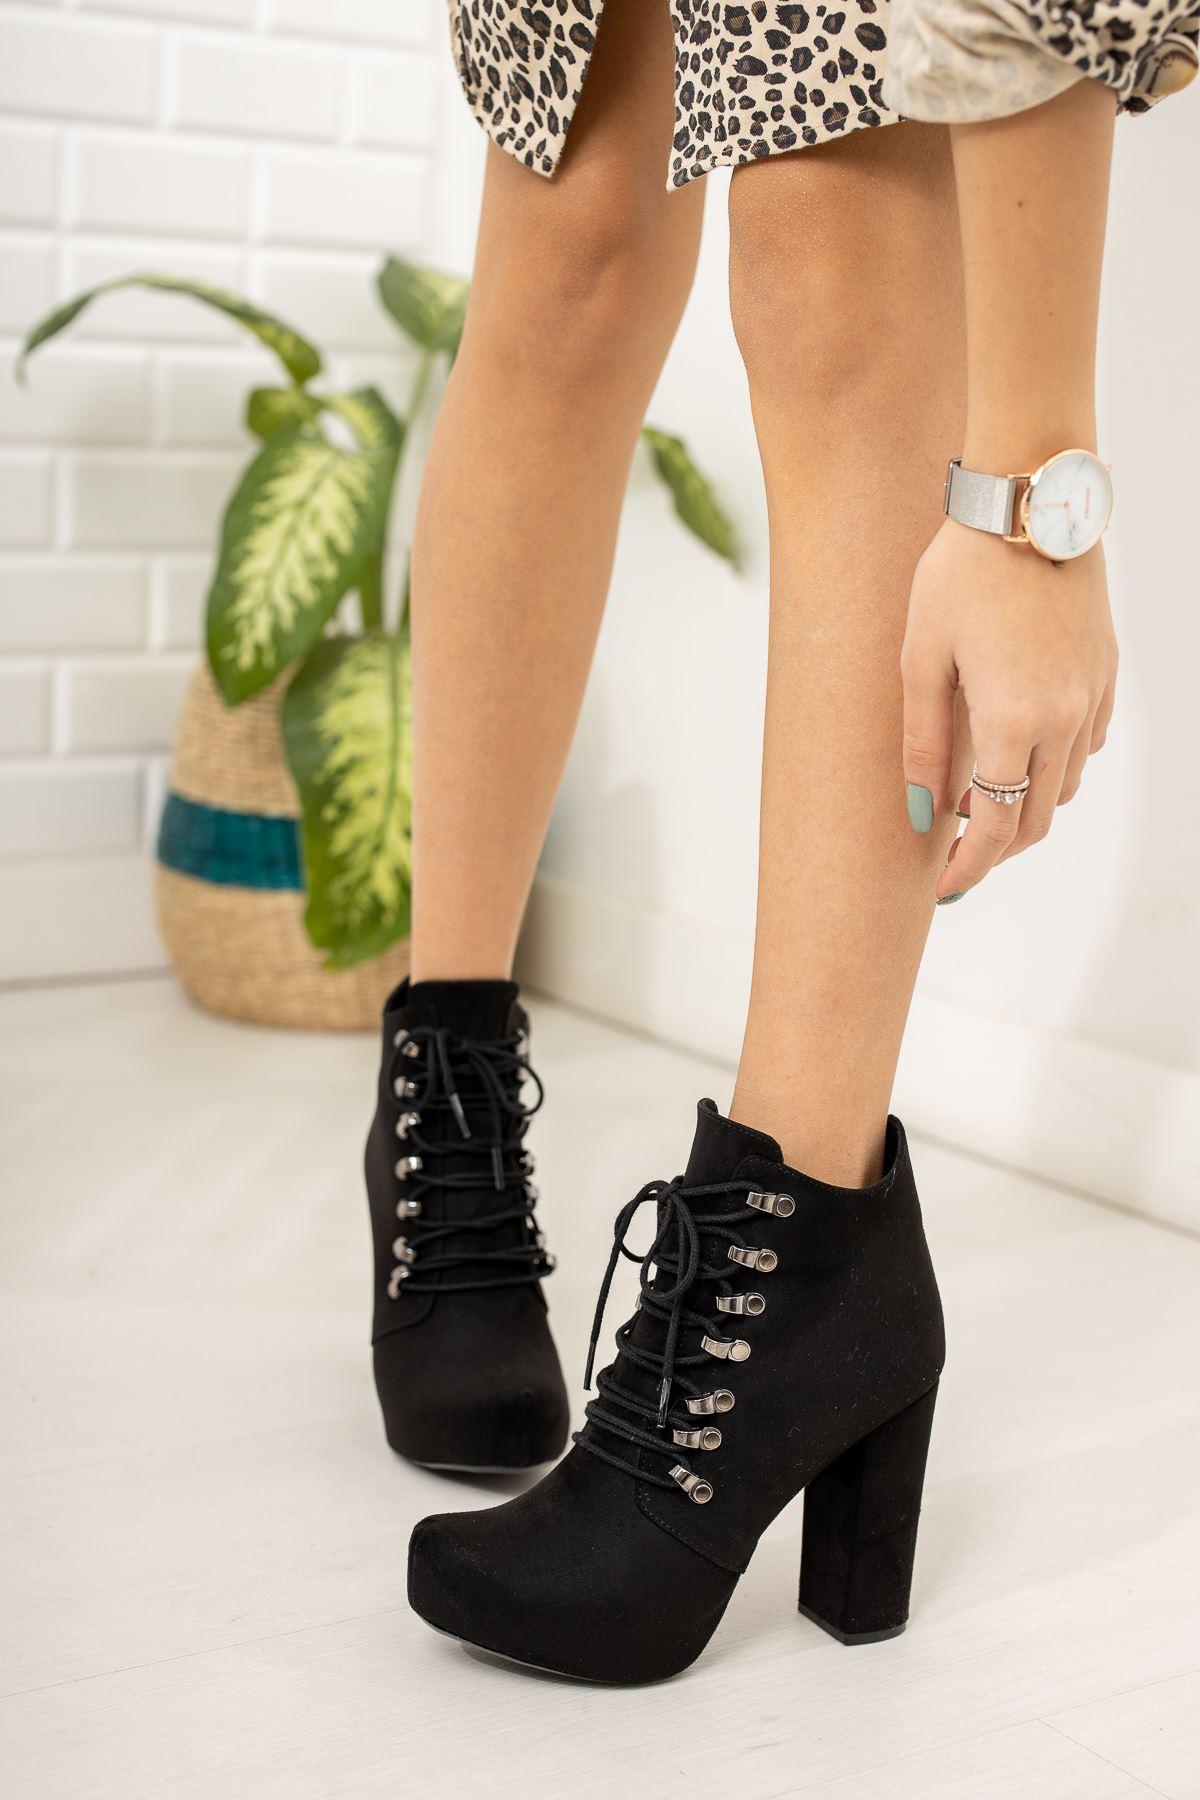 Siyah Süet Kancalı Platform Topuklu Ayakkabı